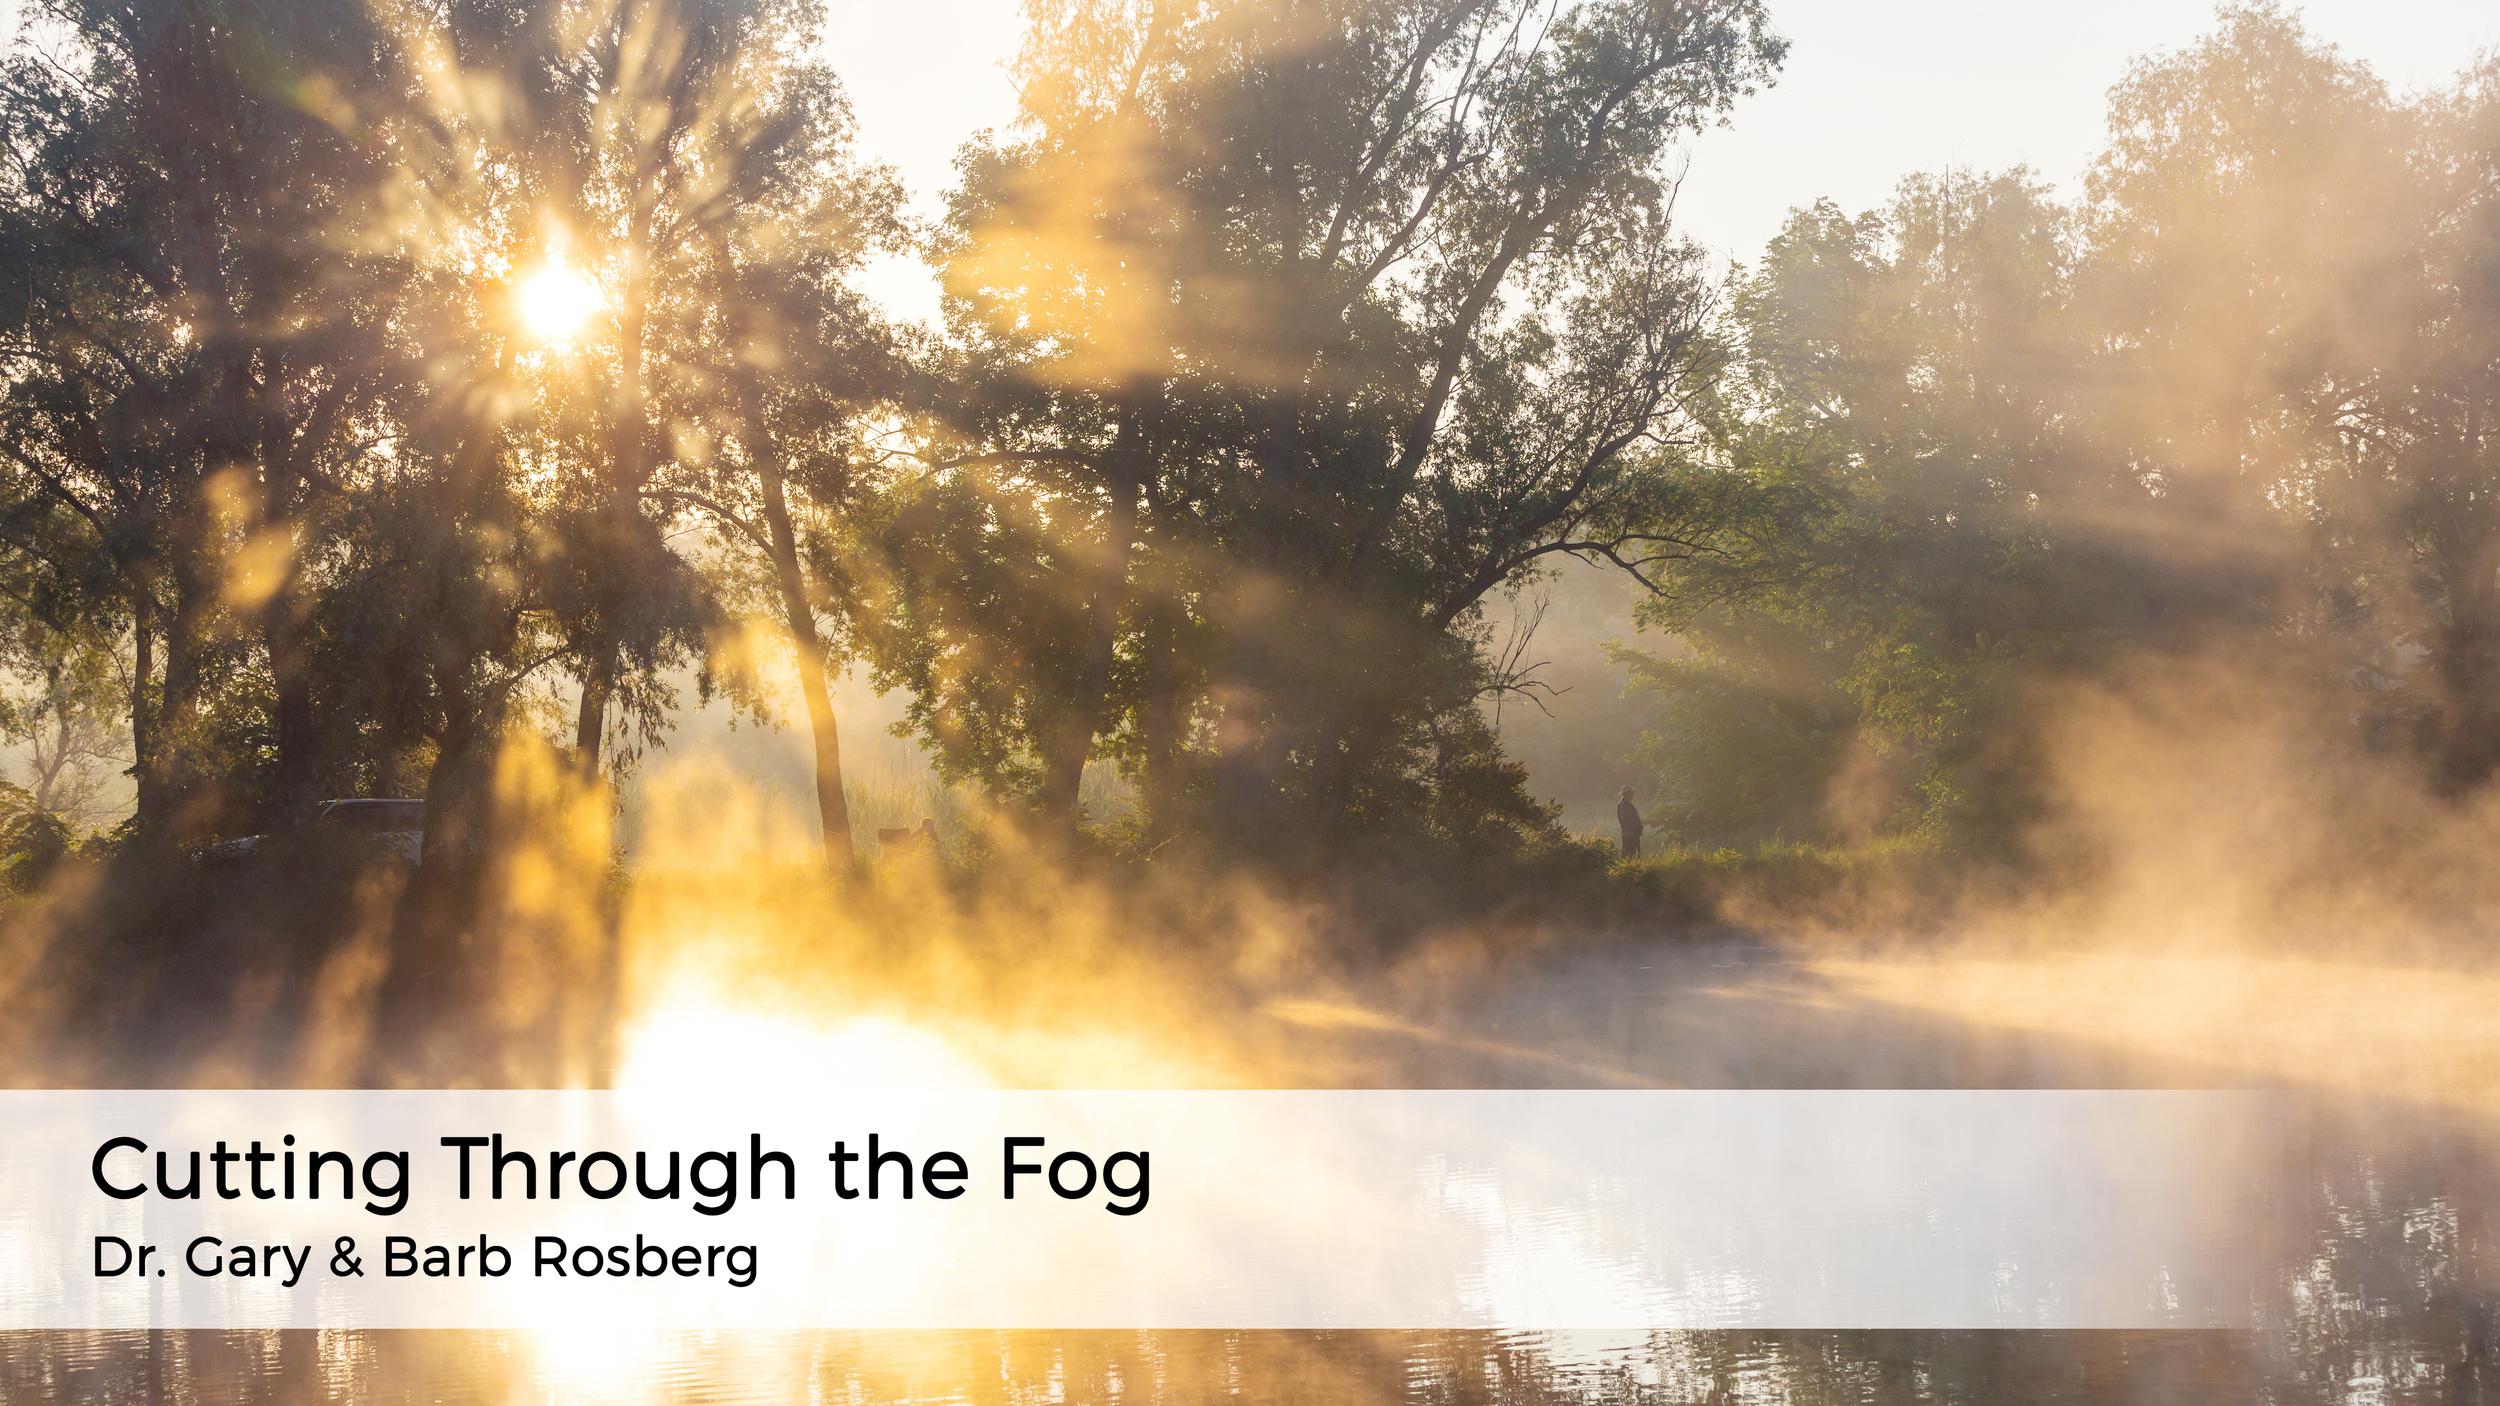 cutting-through-the-fog-americas-family-coaches-blog